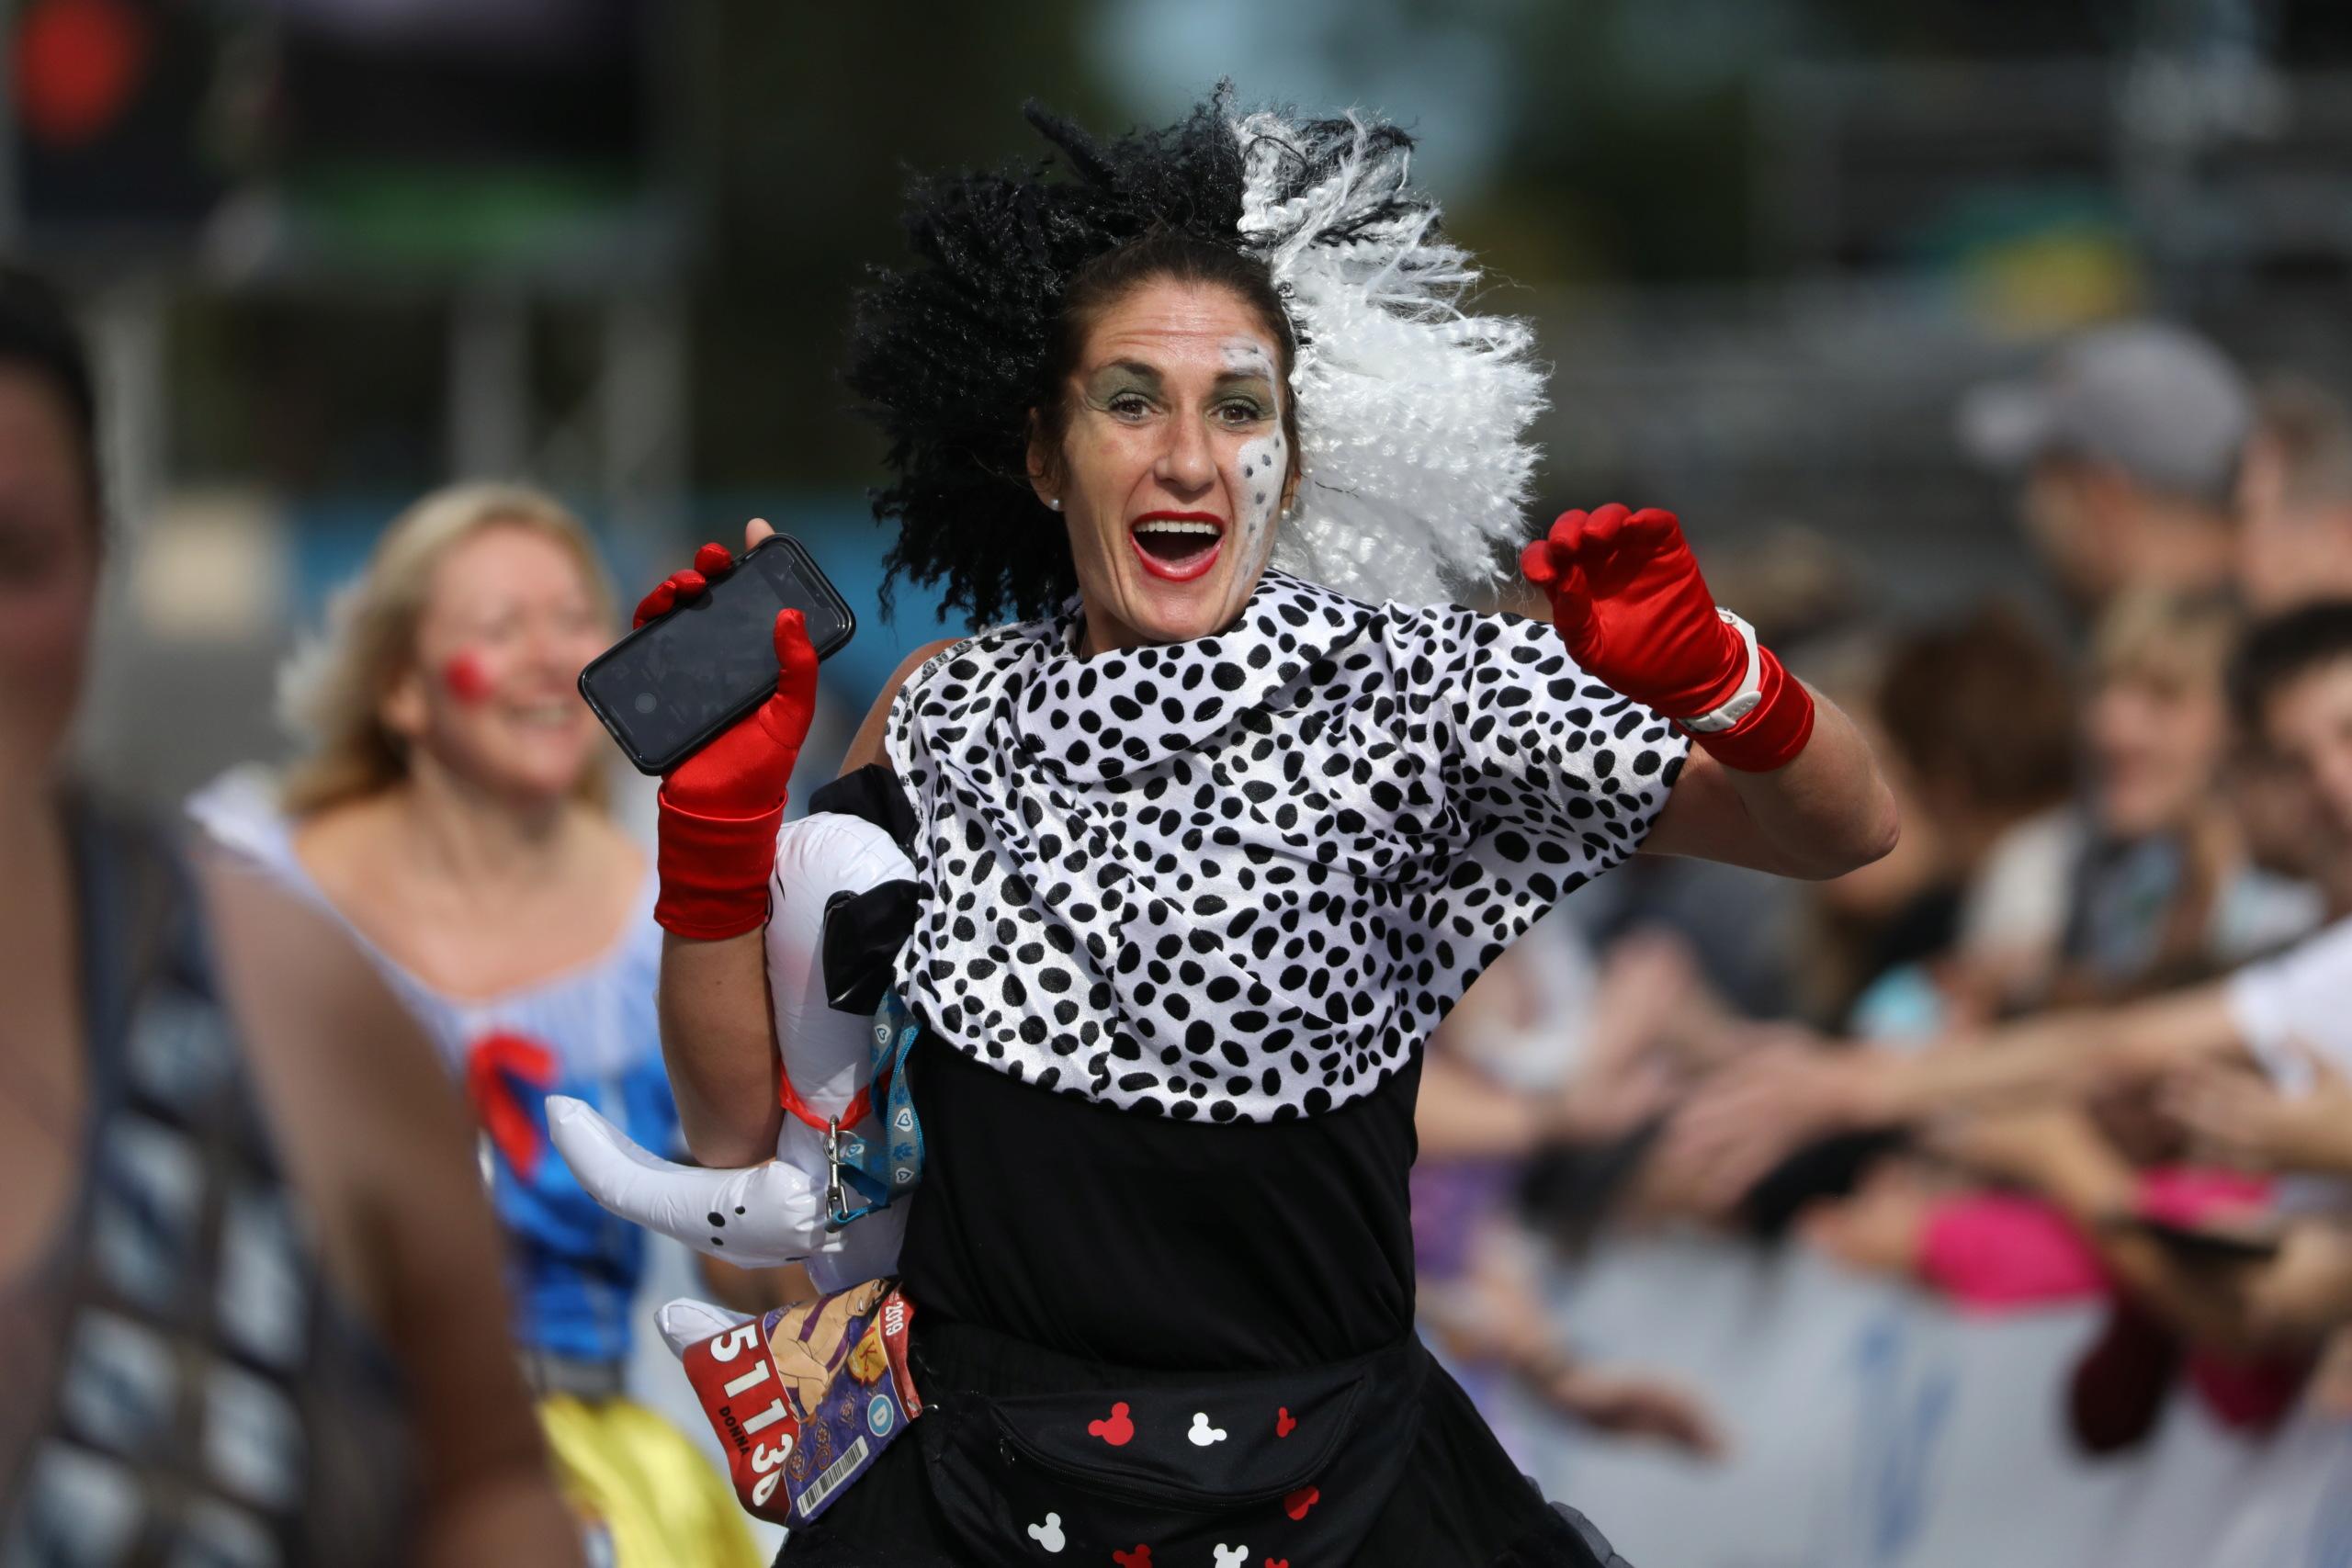 2019 - Disneyland Paris Run Weekend - Pagina 3 21k_1610